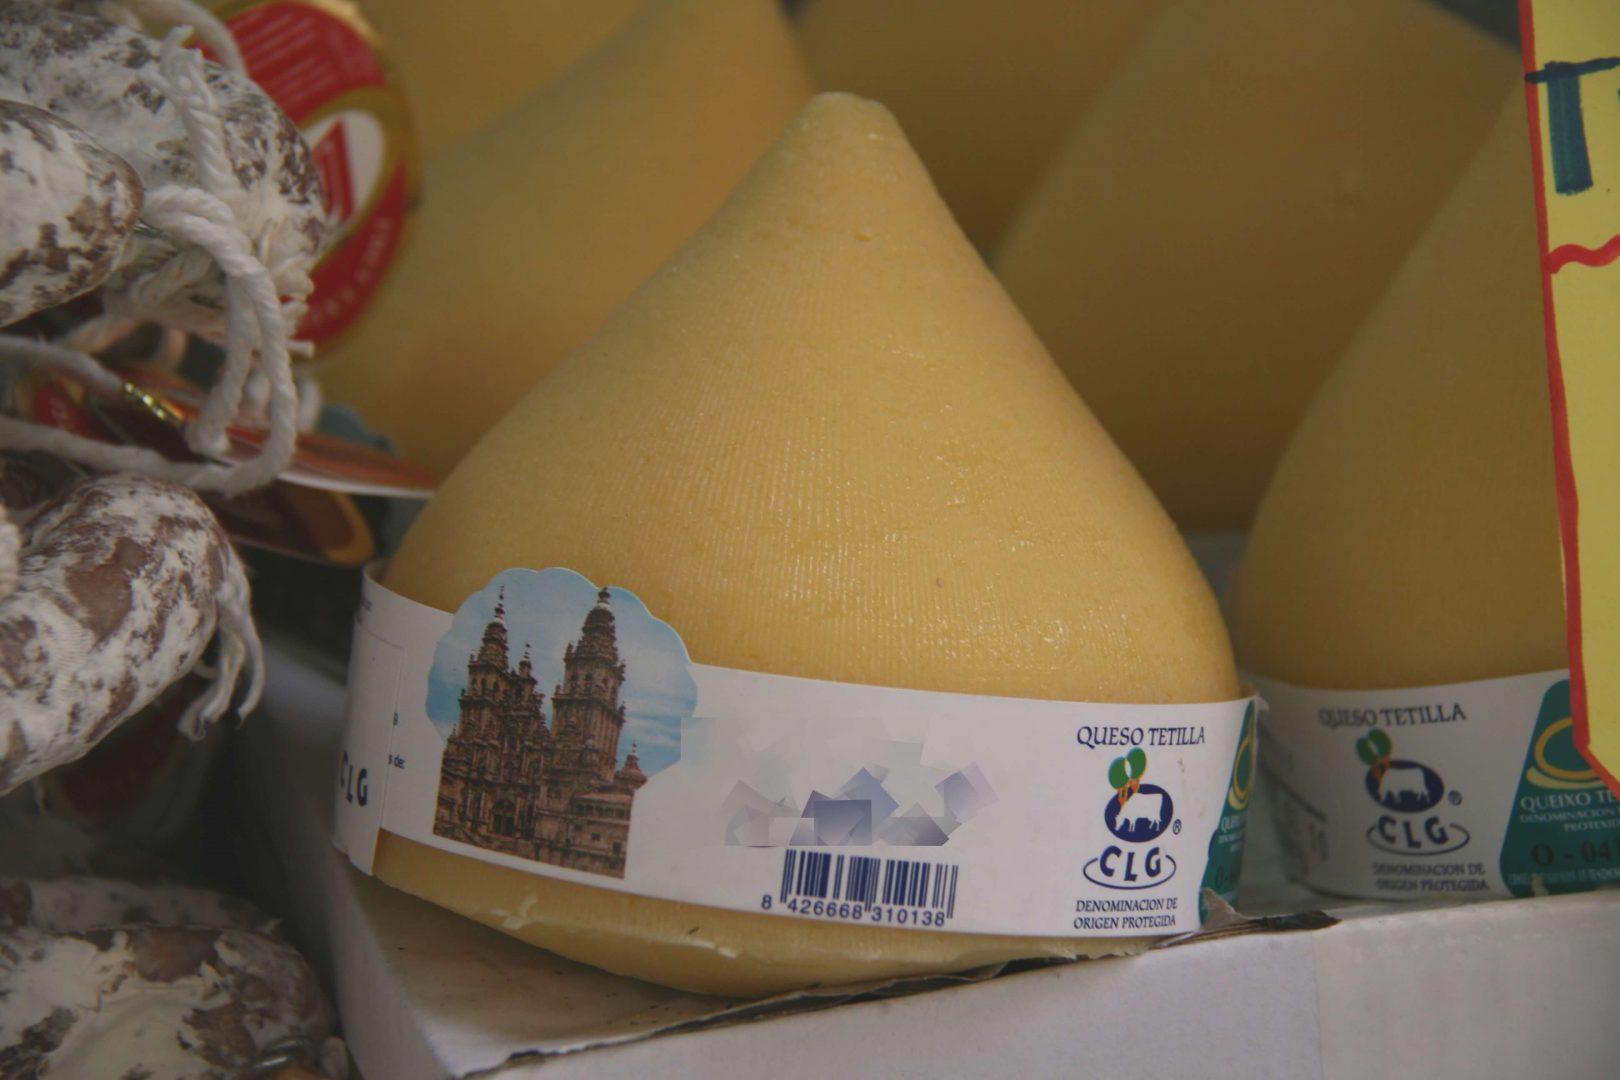 queso de tetilla Galicia gastronomia